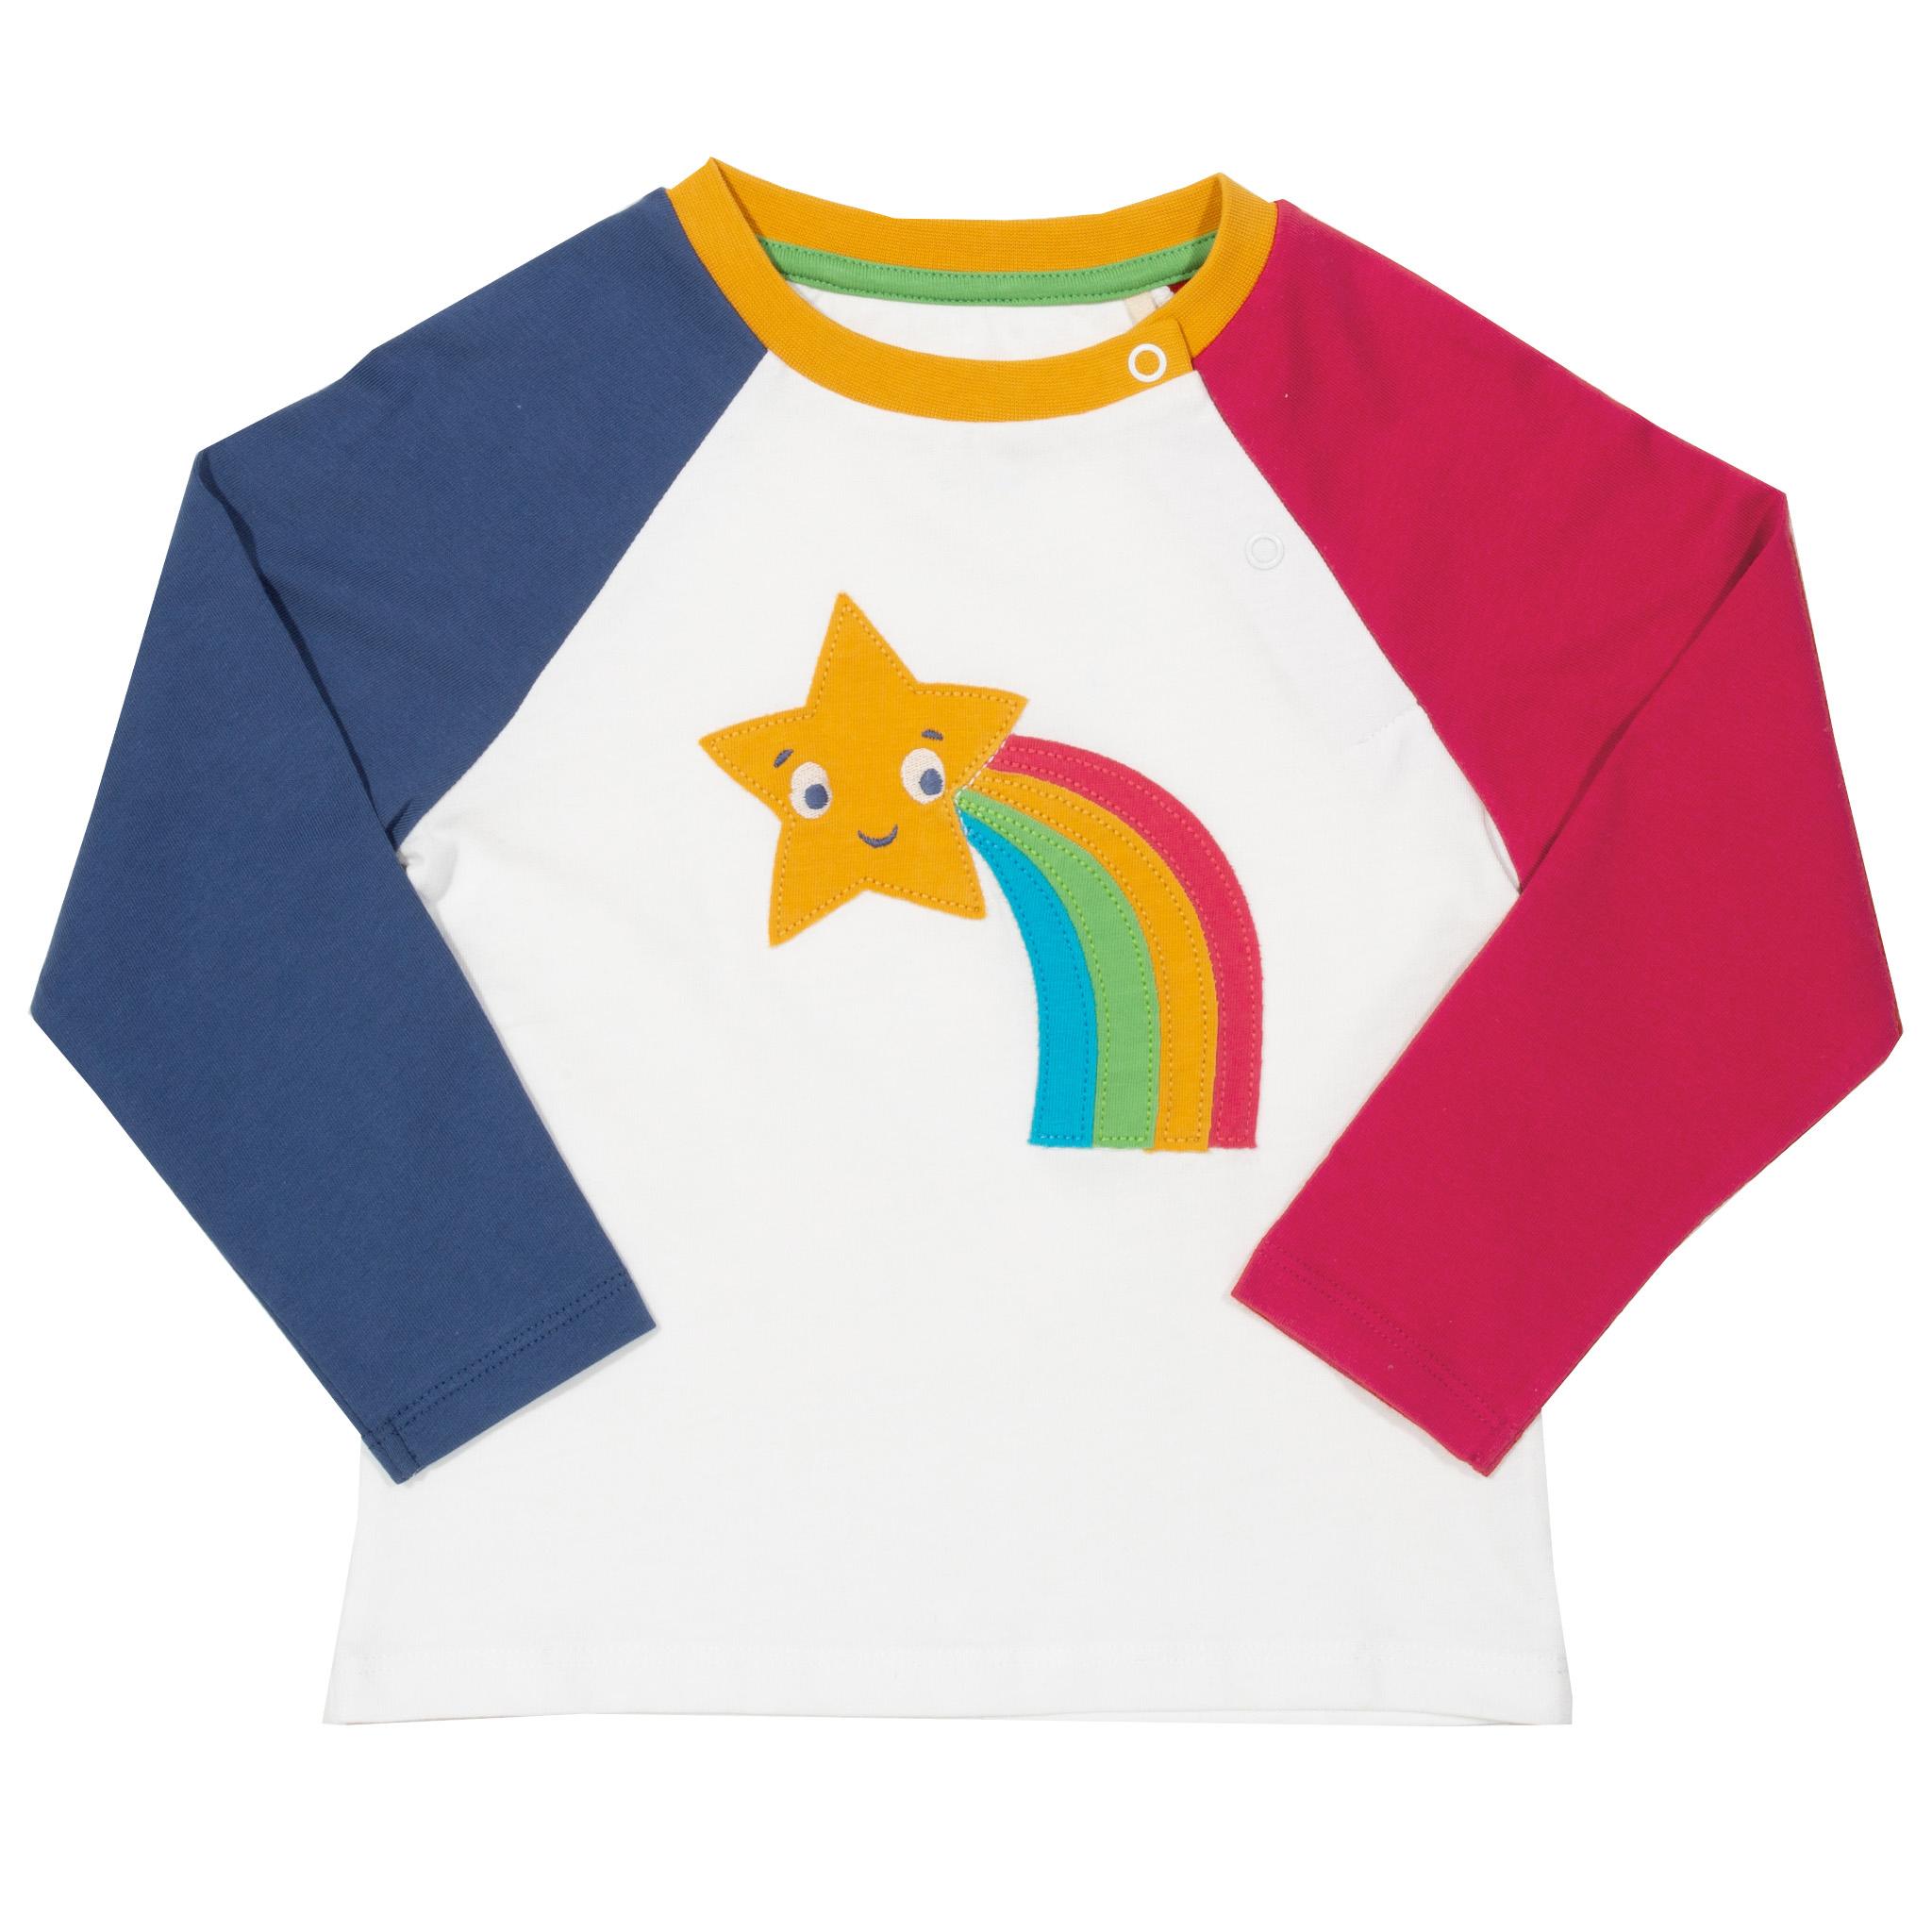 Kite Shooting Star T-Shirt